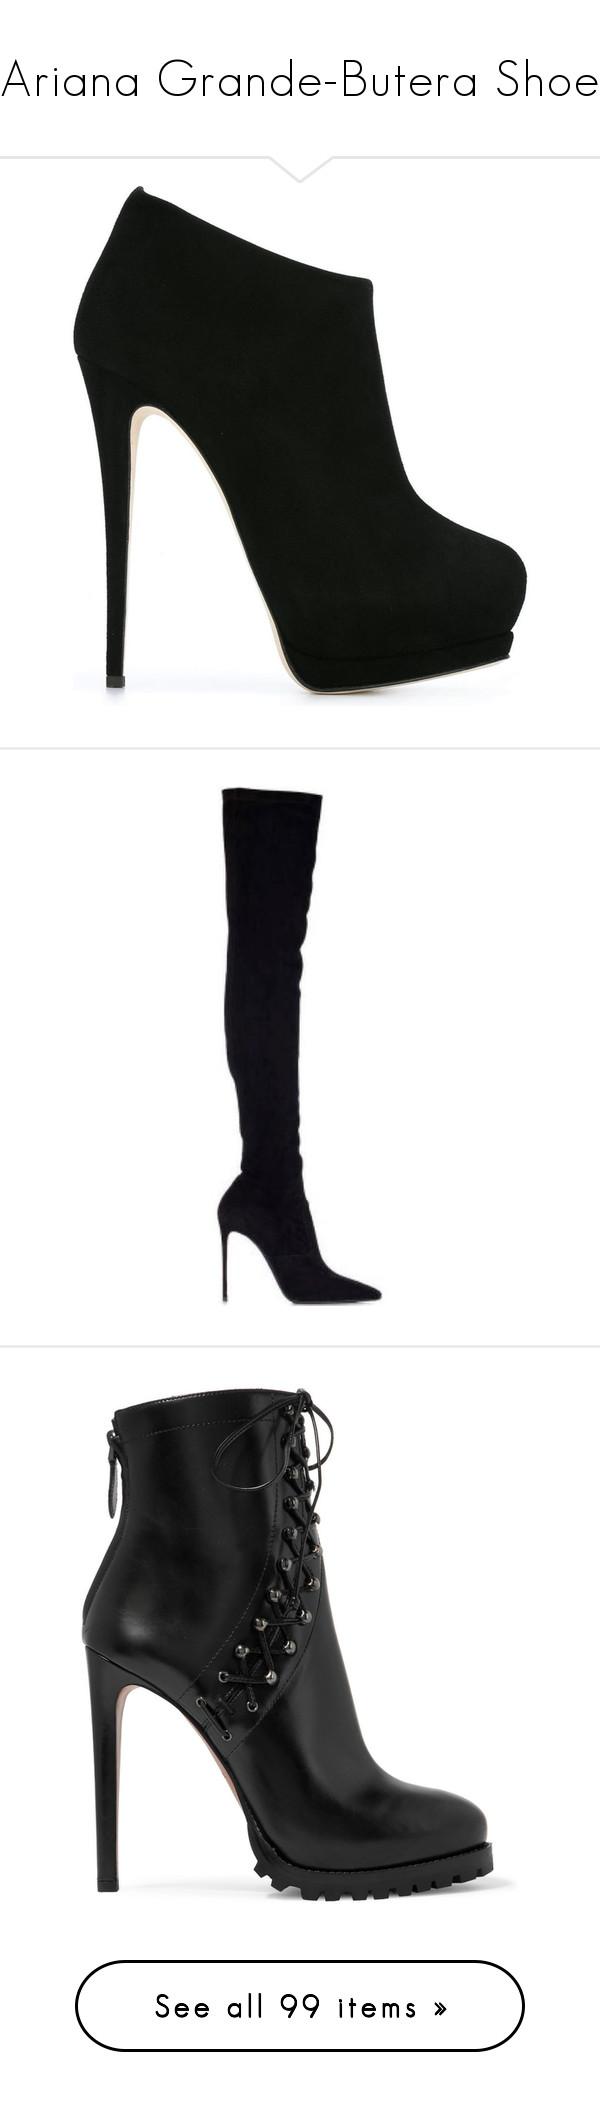 a1fd606d64bc Ariana Grande-Butera Shoe